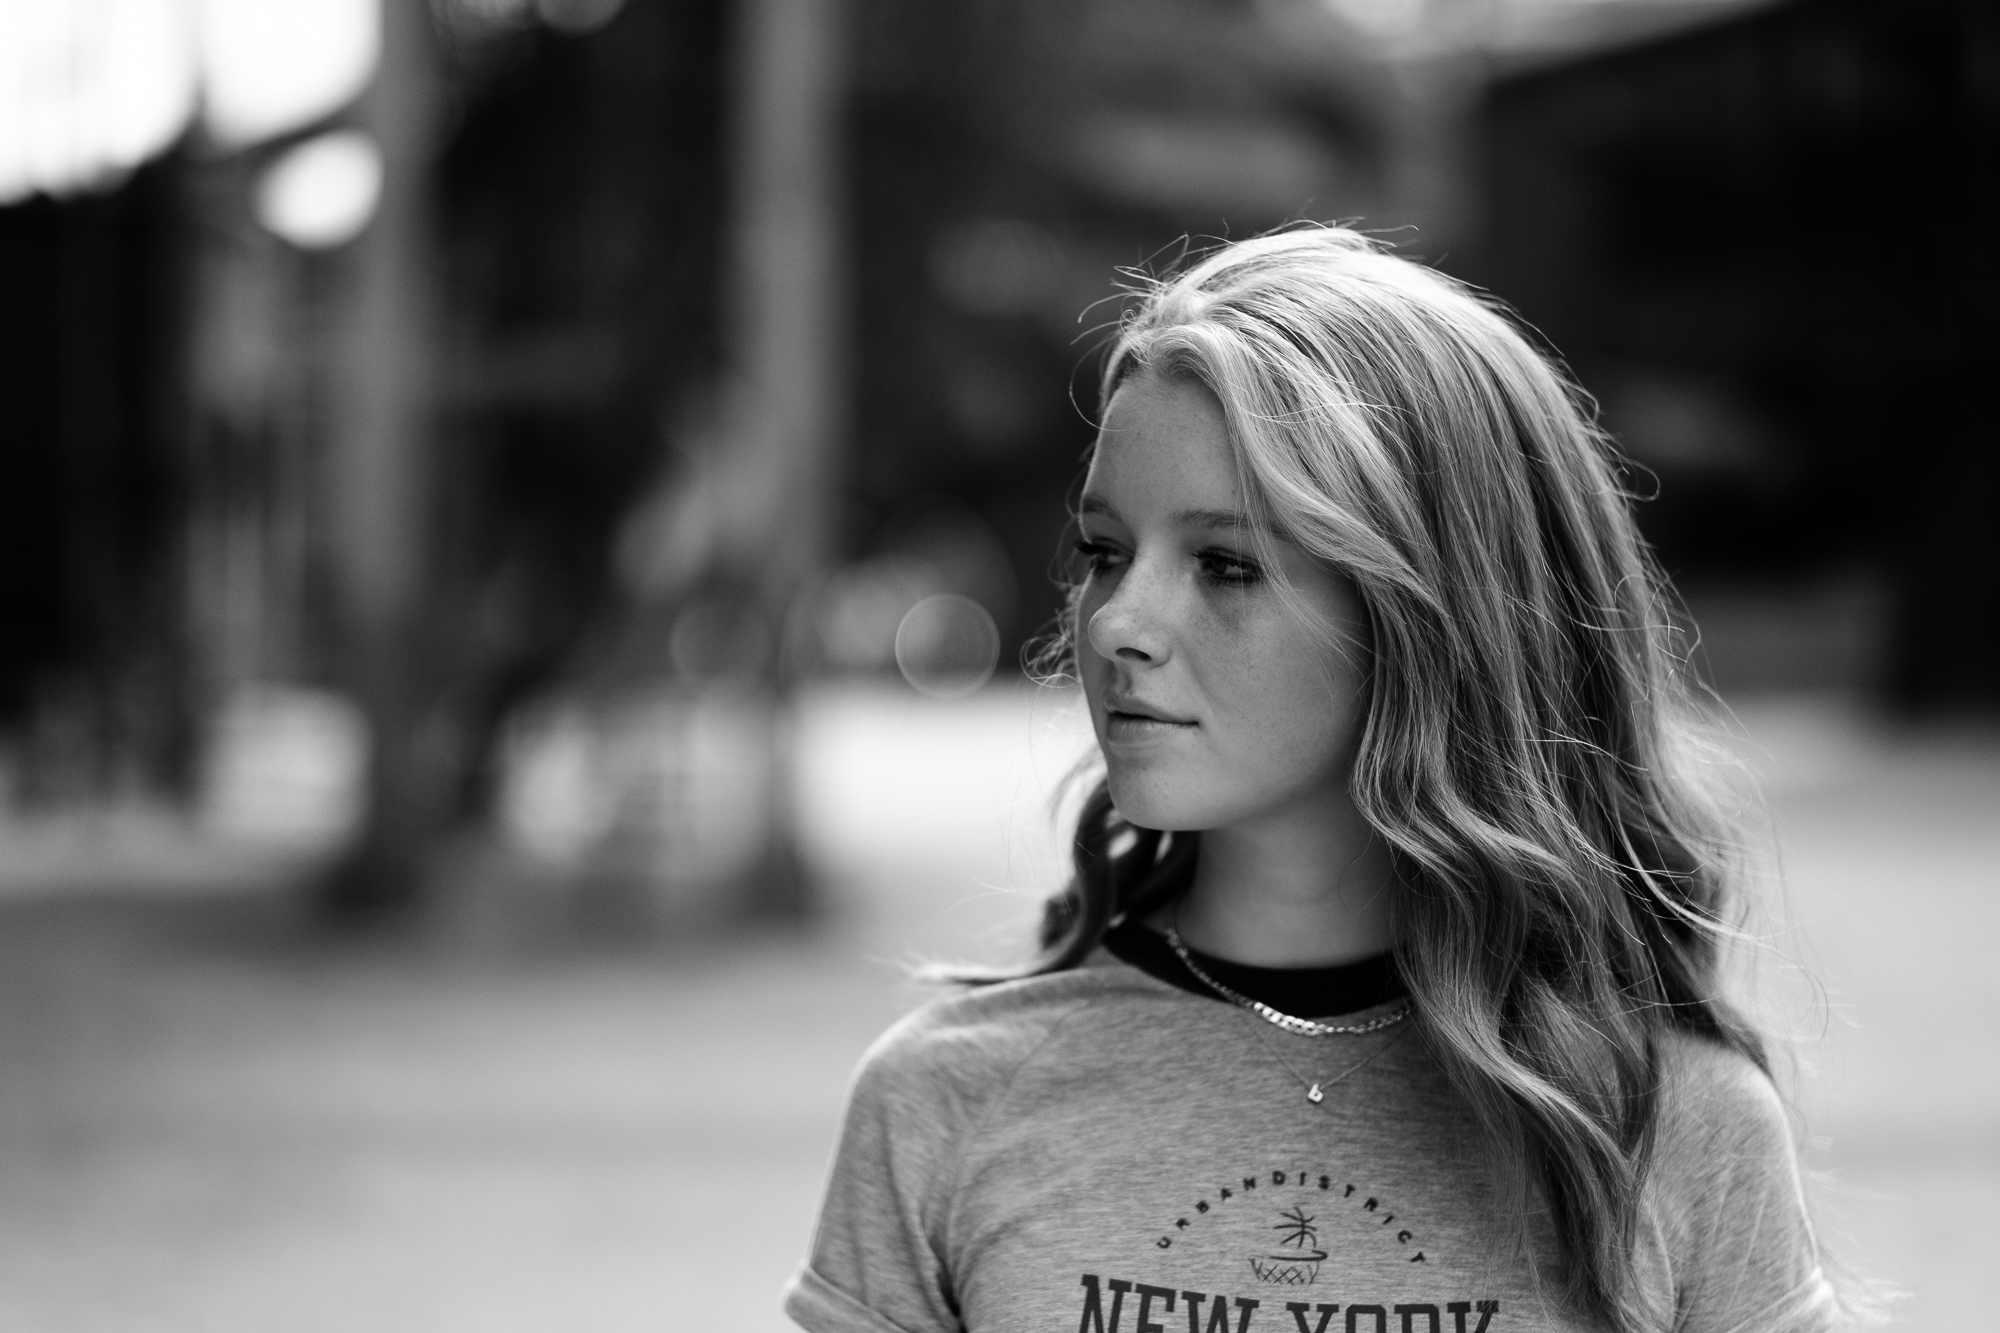 Profile portrait of a girl